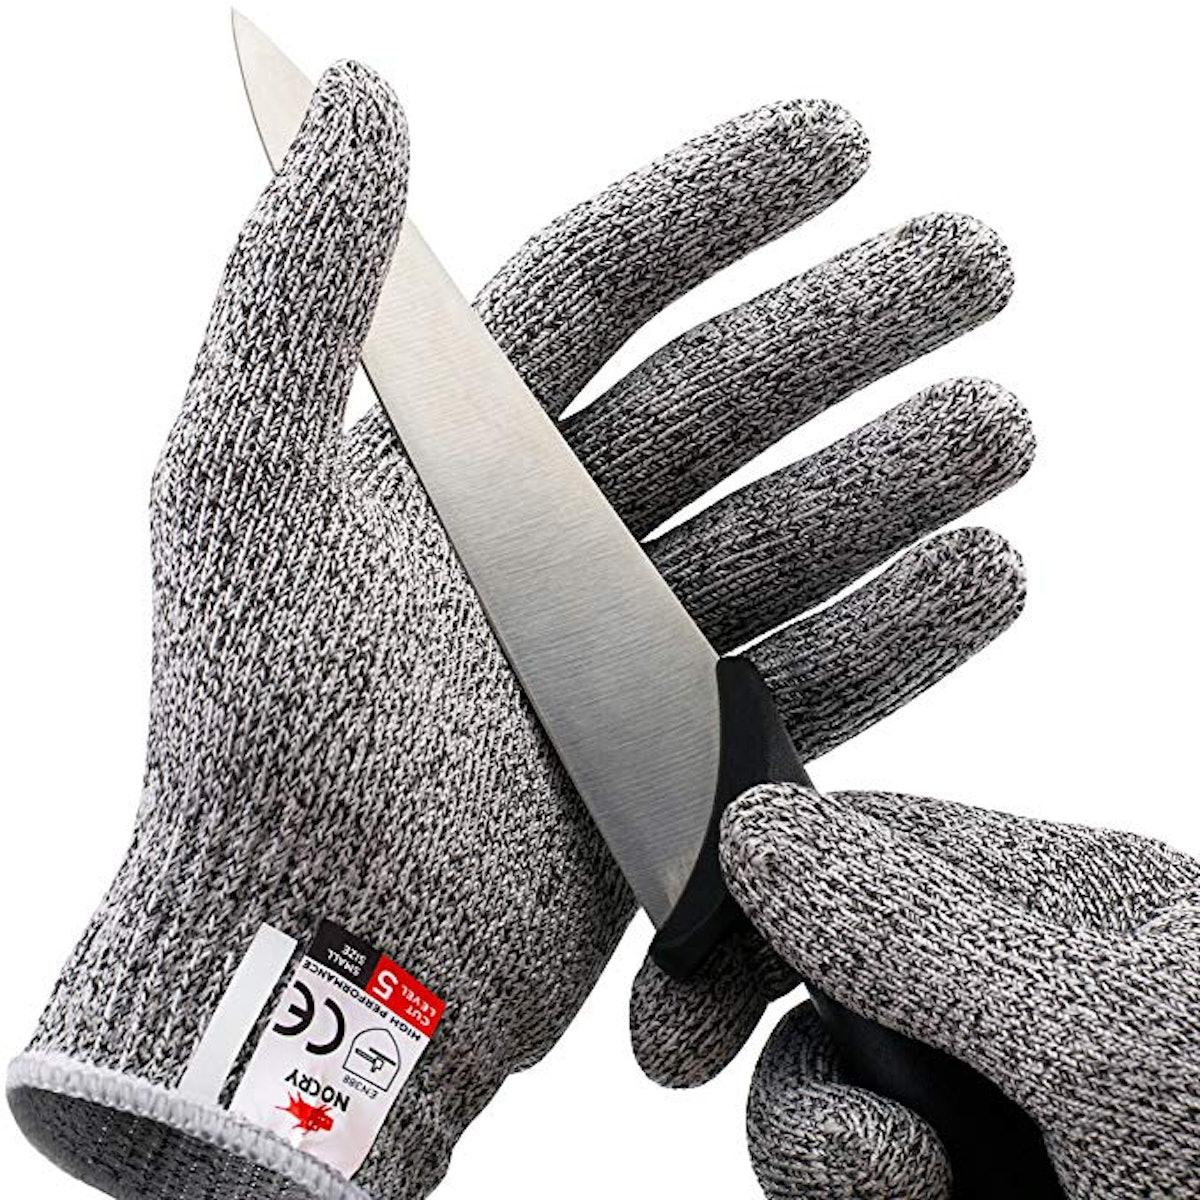 NoCry Cut Resistant Gloves